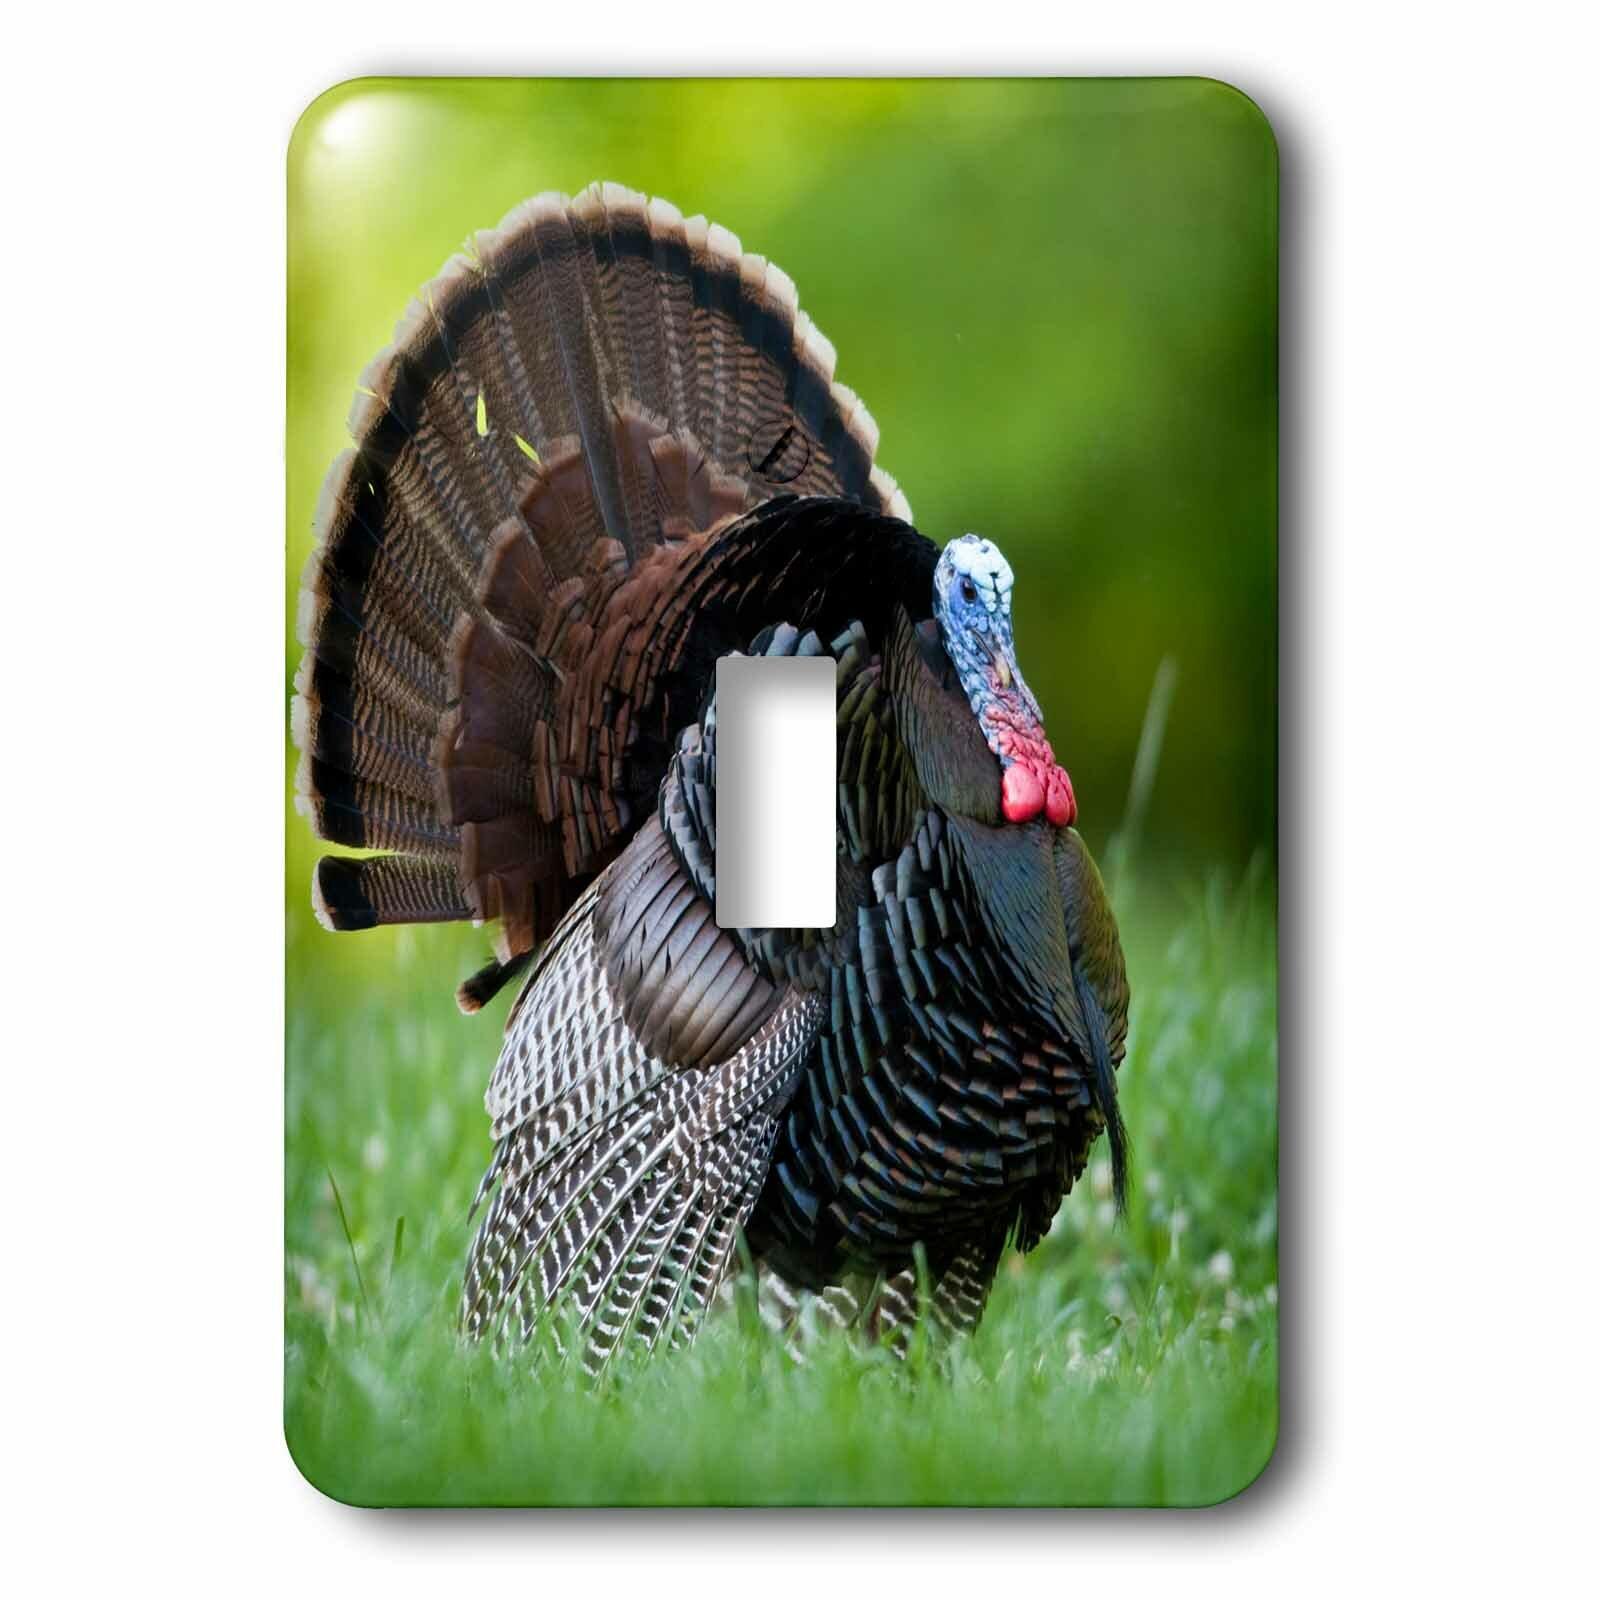 3drose Wild Turkey Gobbler 1 Gang Toggle Light Switch Wall Plate Wayfair